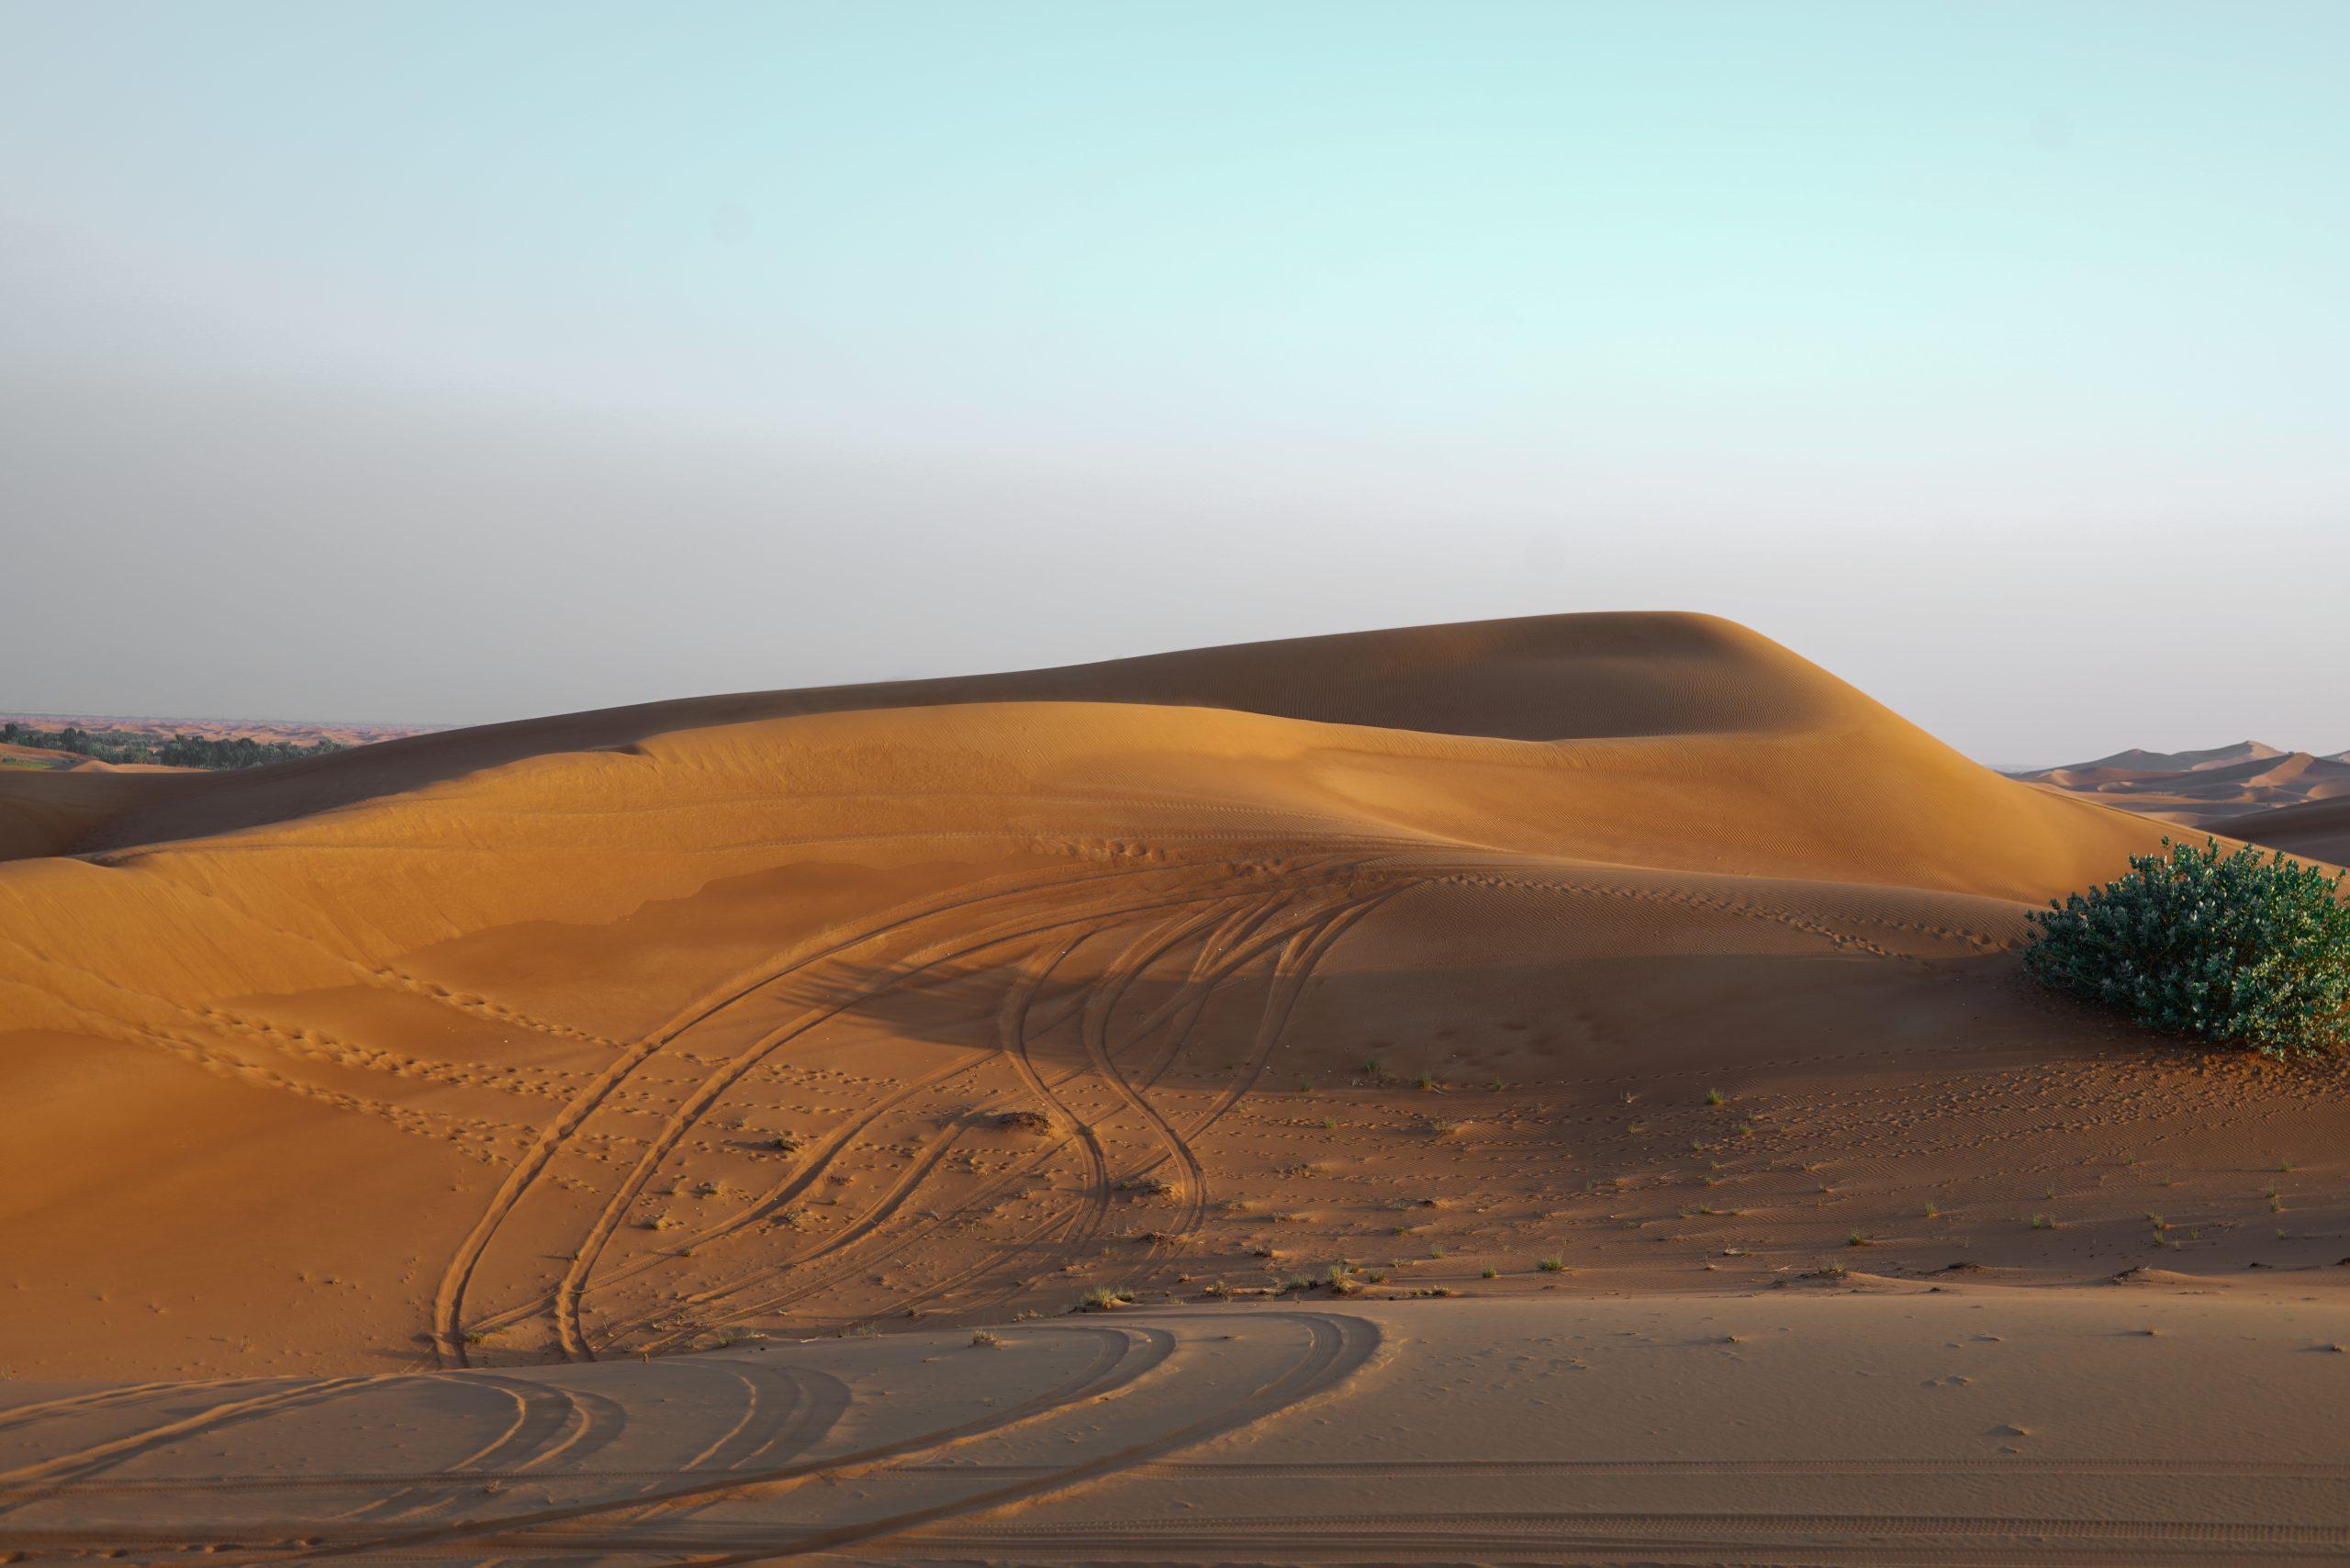 A desert in Dubai